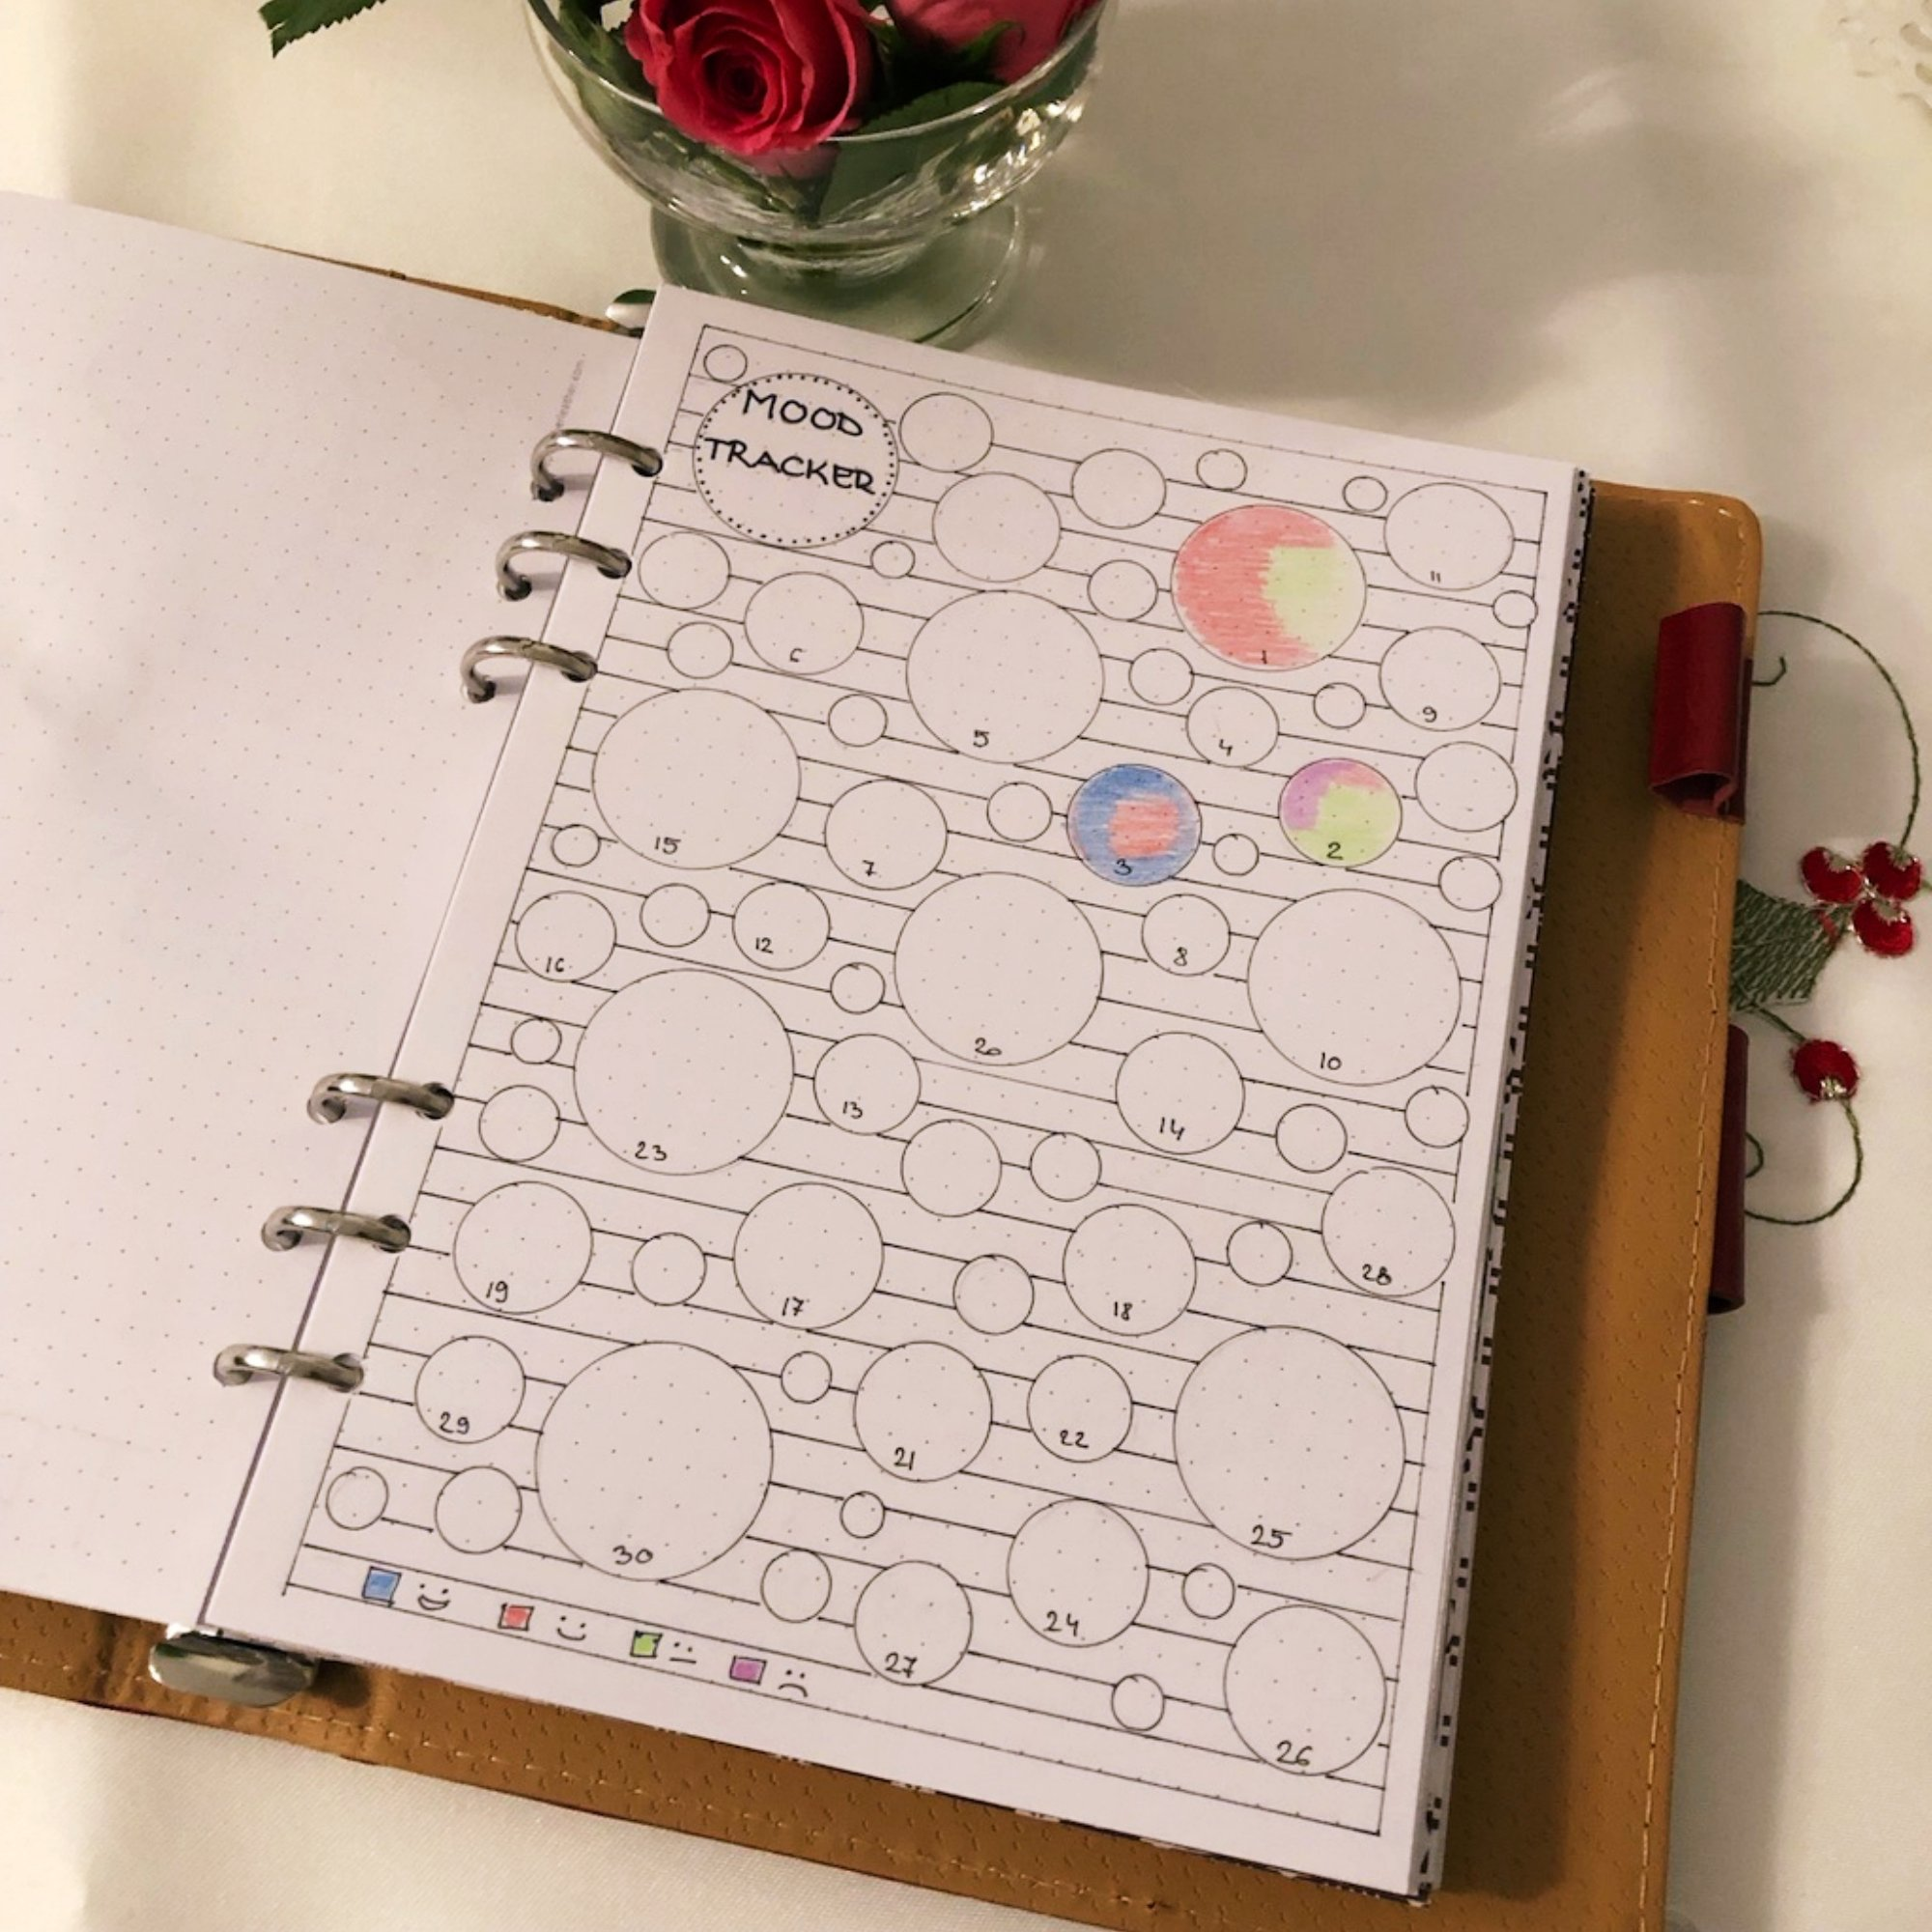 Mood tracker - Bubbles - itstartswithacoffee.com #moodtracker #tracker #journaling #planning #creativejournal #creativejournaling